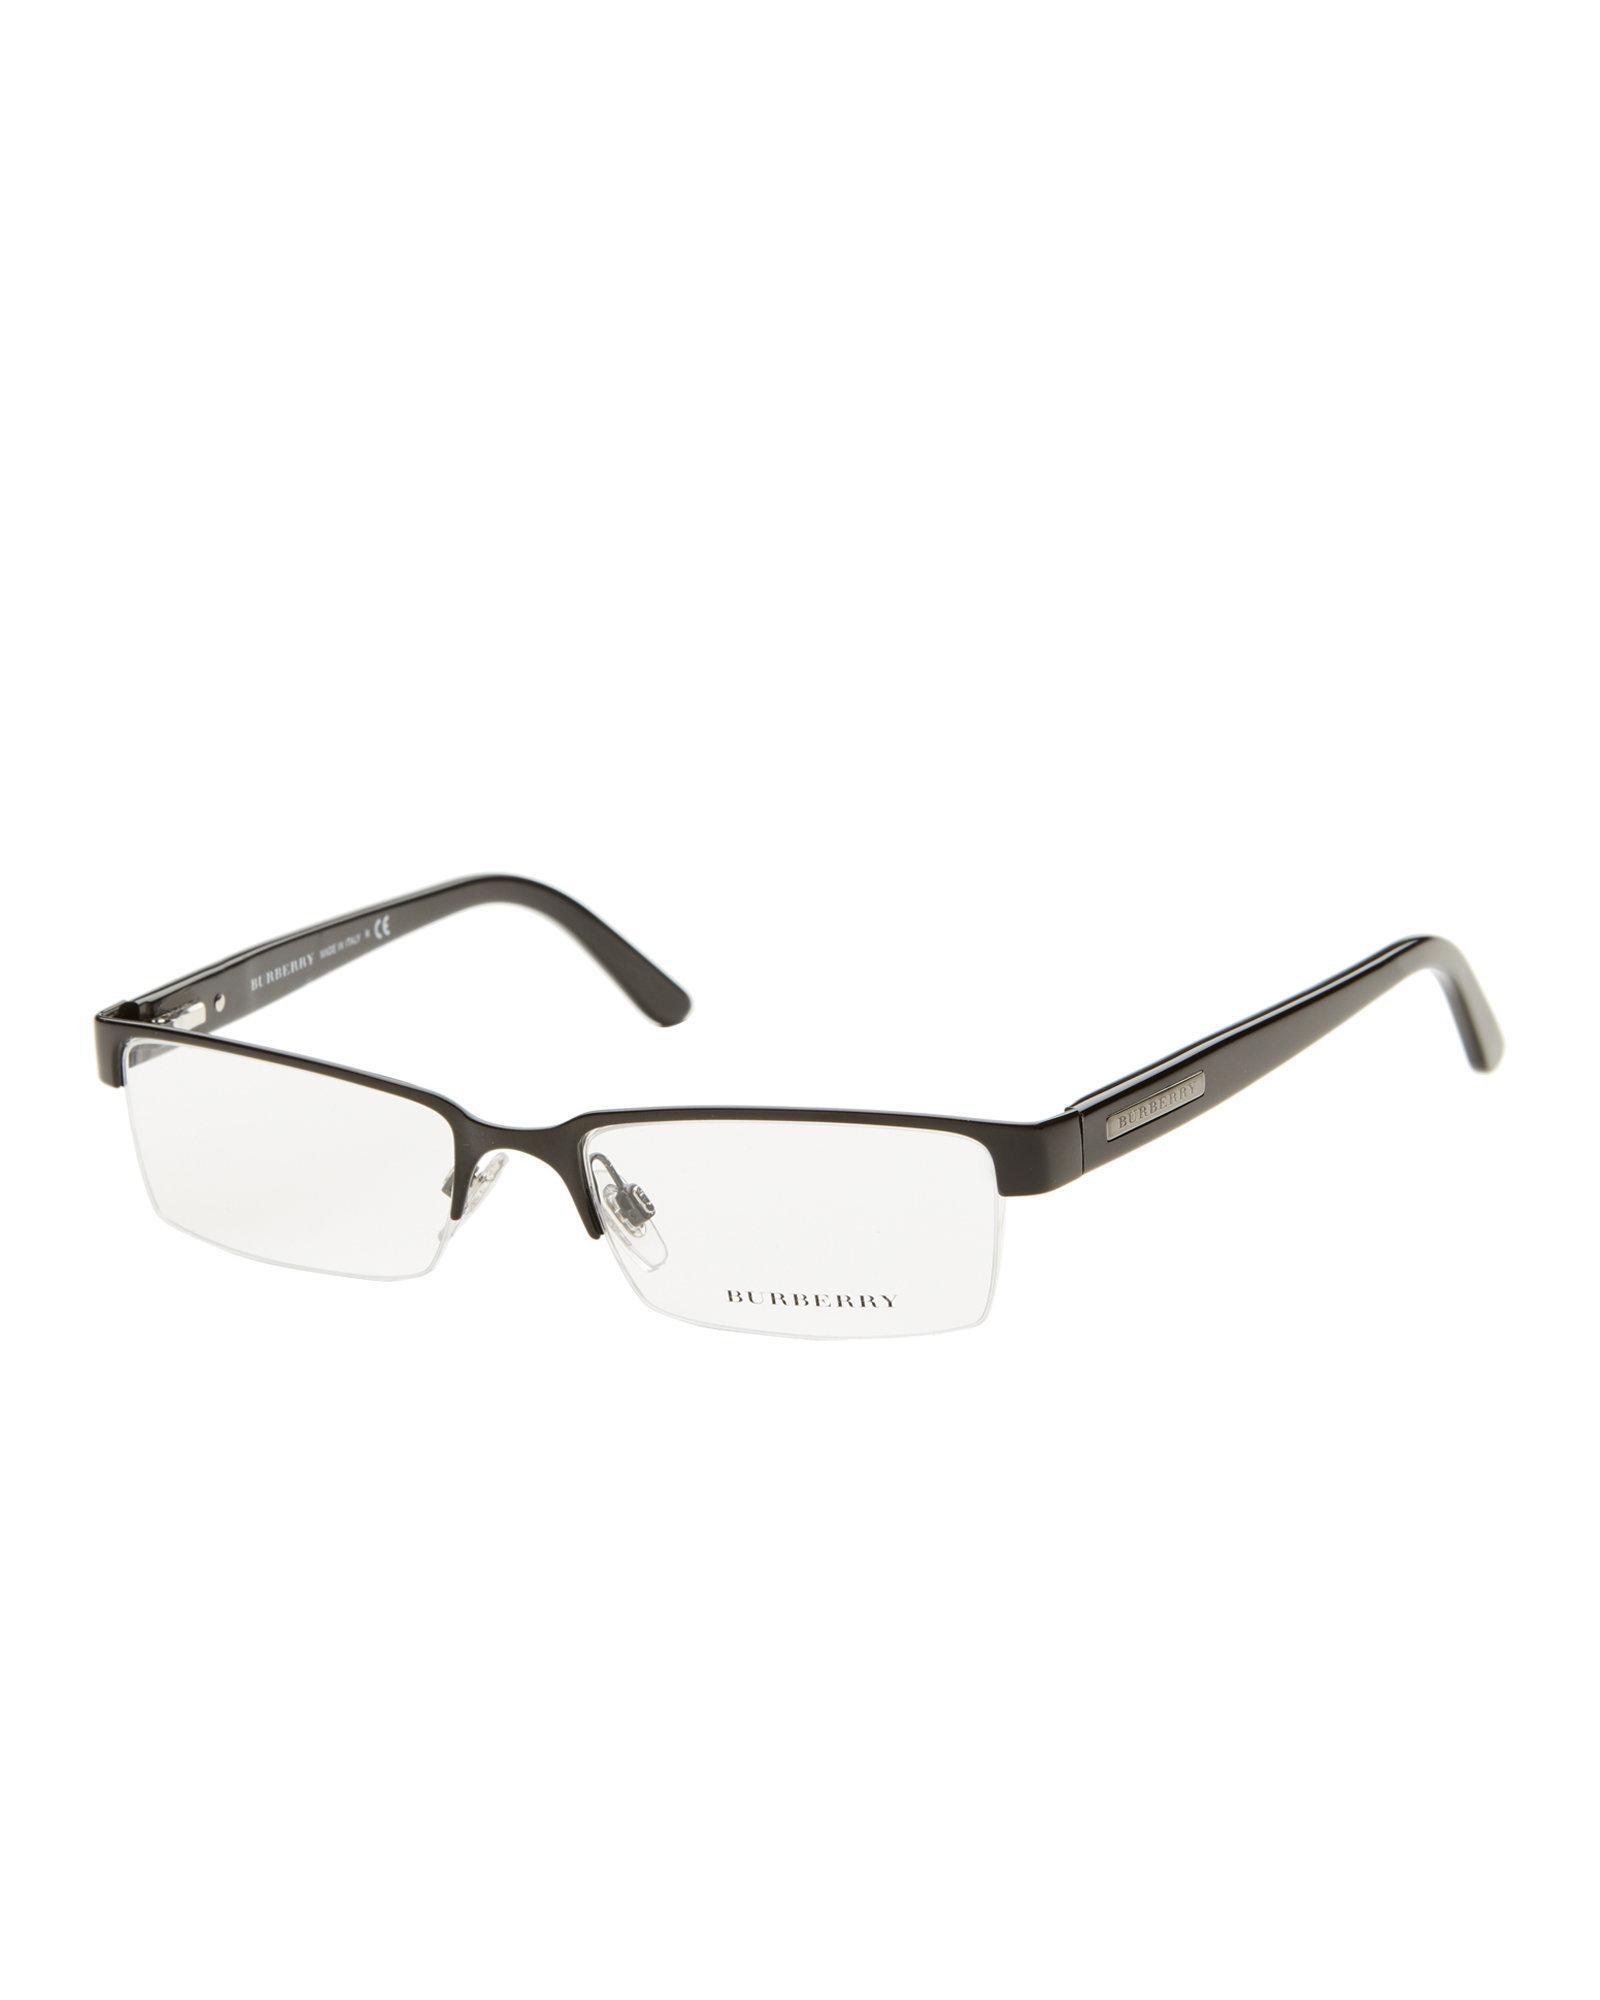 19ed4efff24d Burberry Be1156 Black Rectangle Half-rim Optical Frames - Lyst